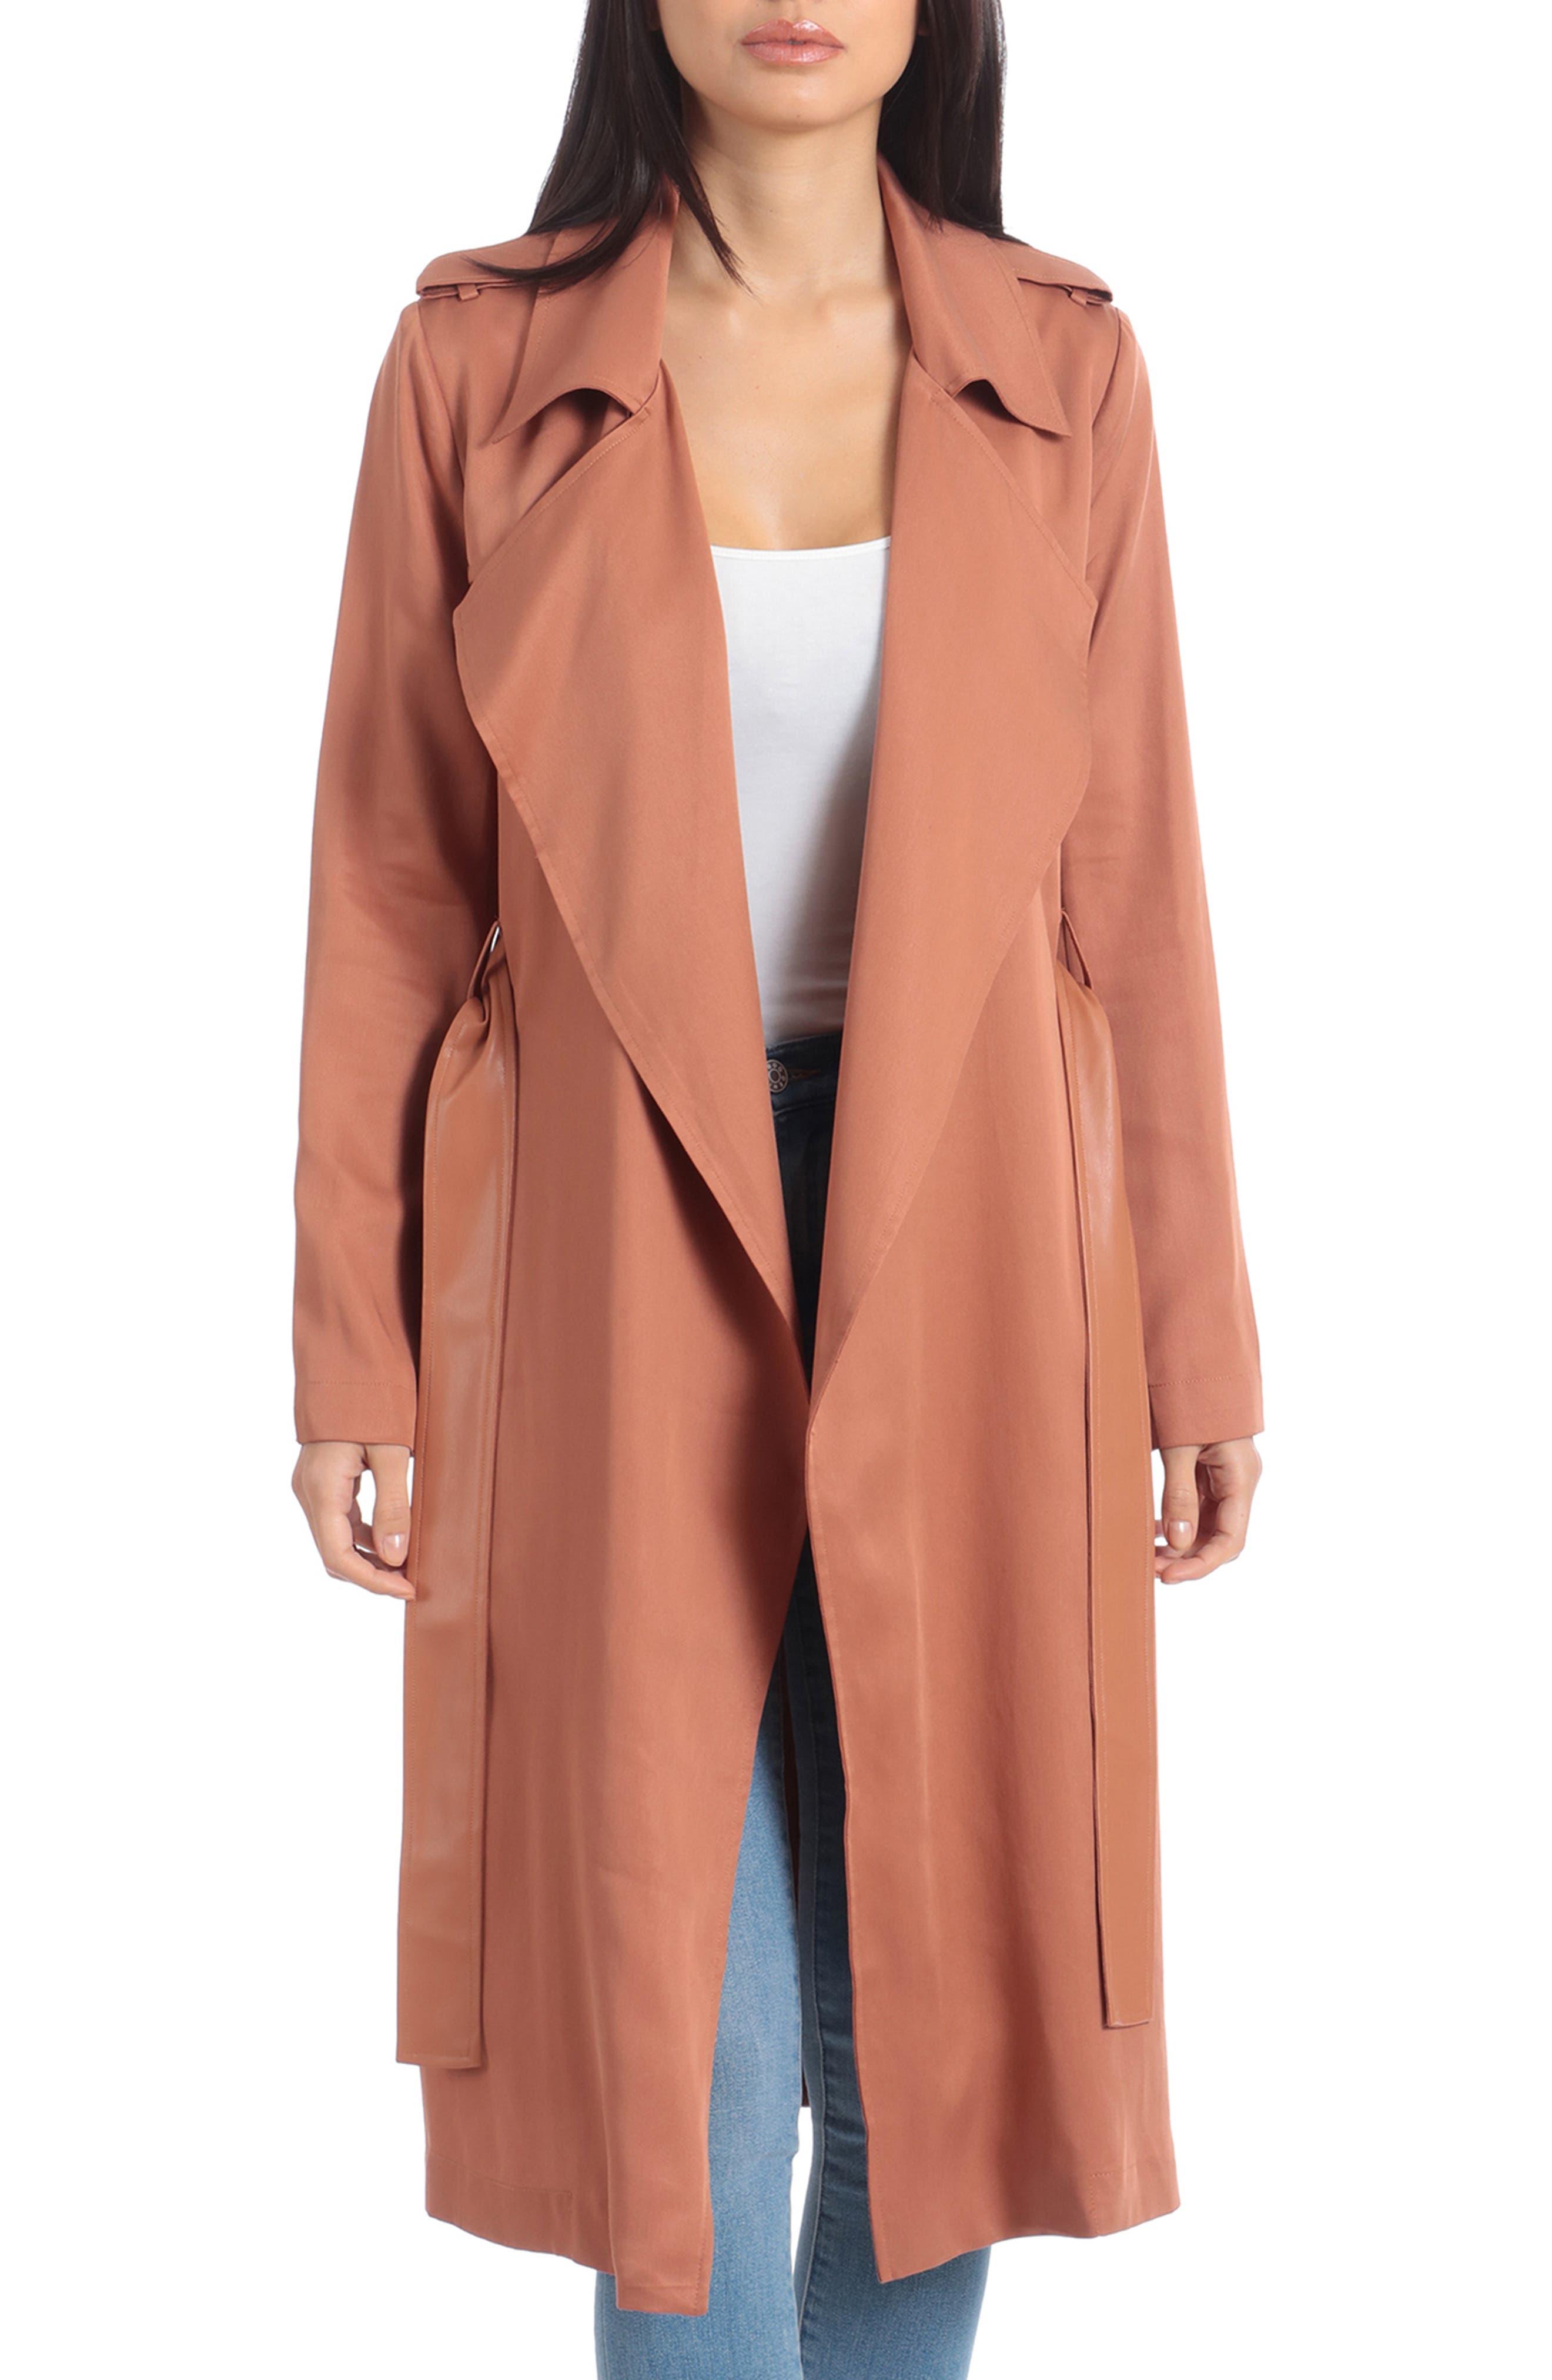 Badgley Mischka Faux Leather Trim Long Trench Coat, Main, color, CEDAR